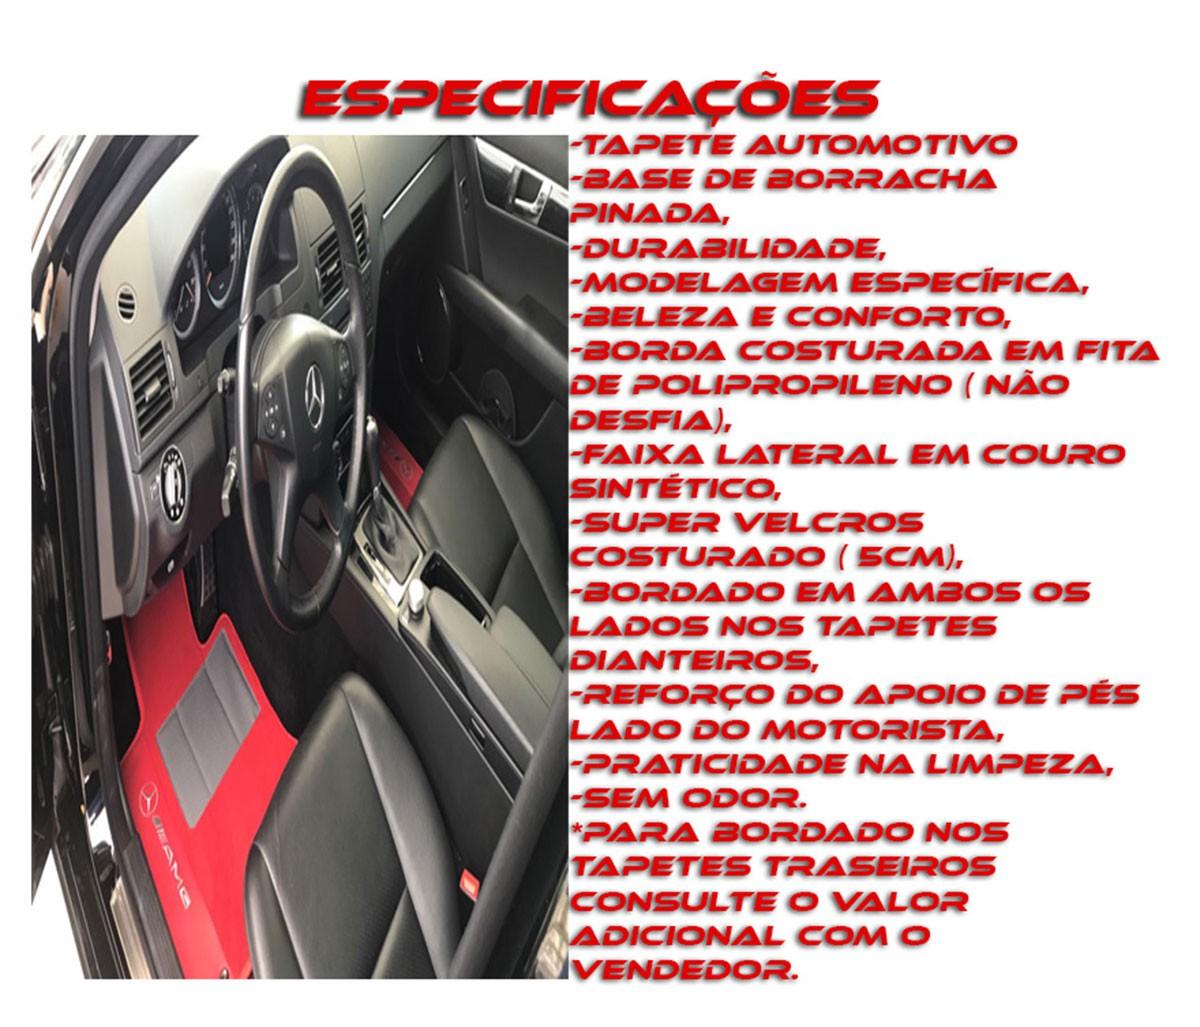 Kit Tapete Bravo Sporting Carpete Premium  Hitto